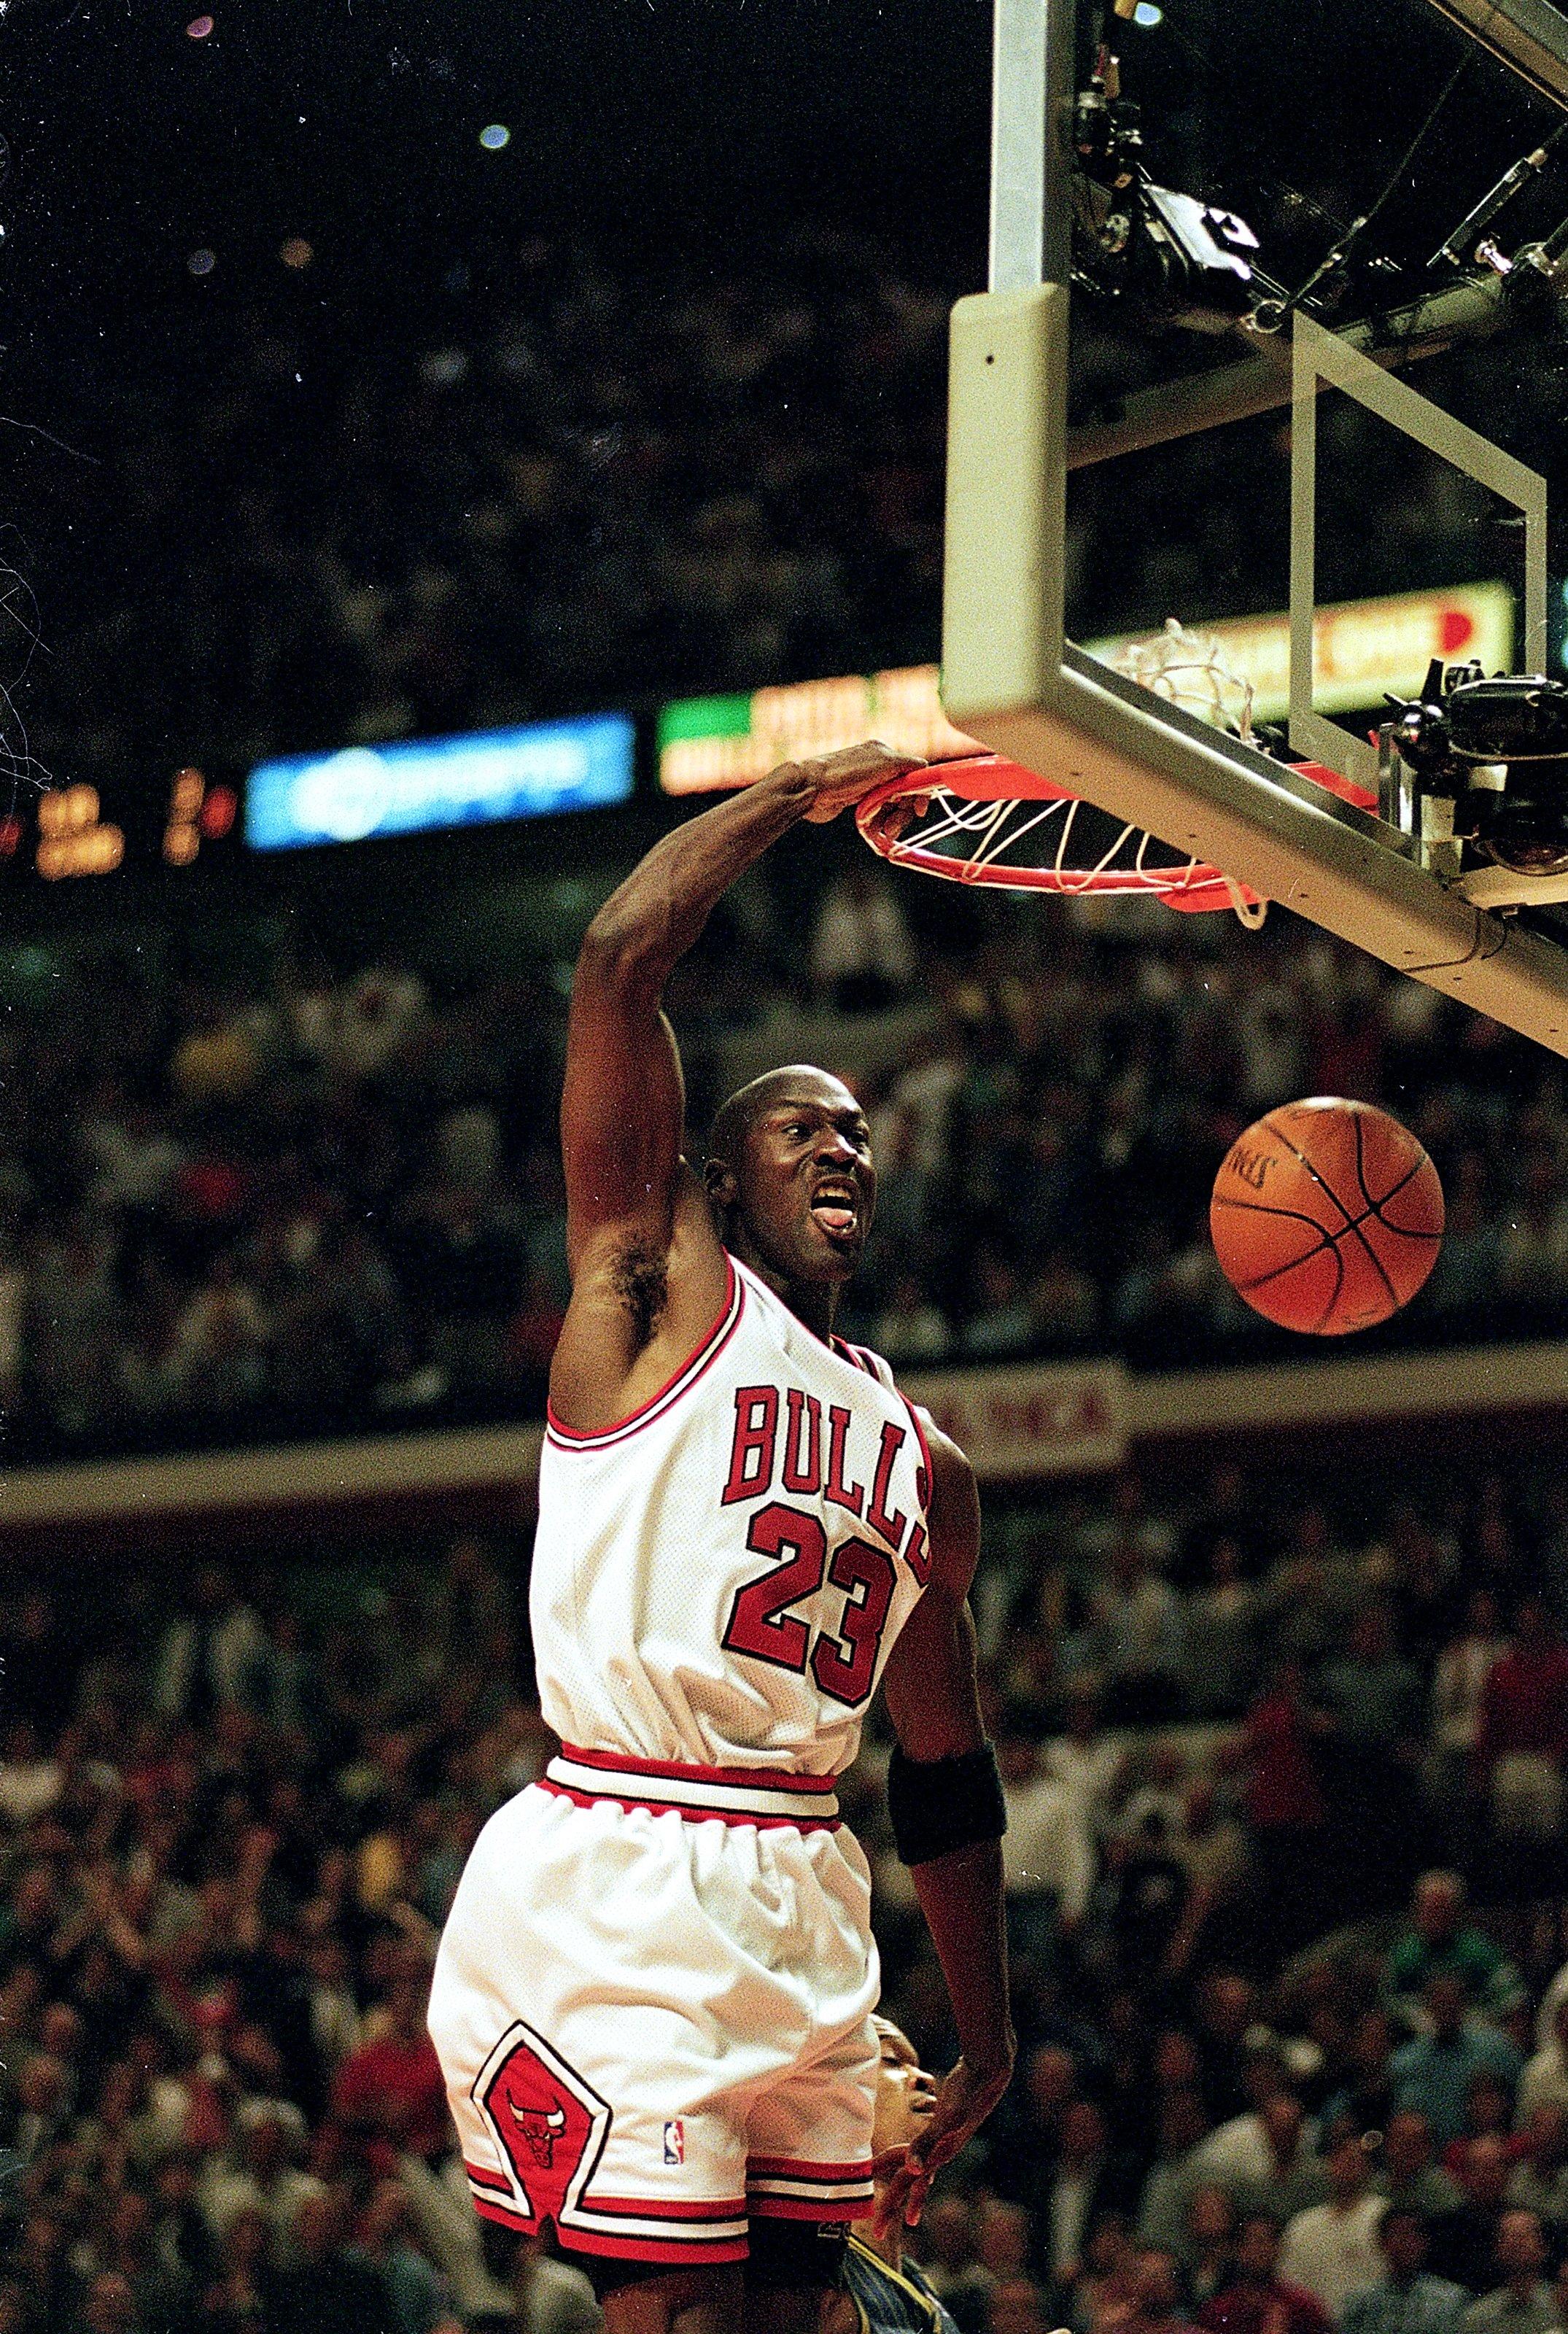 696026b3cb7006 19 May 1998  Michael Jordan  23 of the Chicago Bulls dunks the ball during